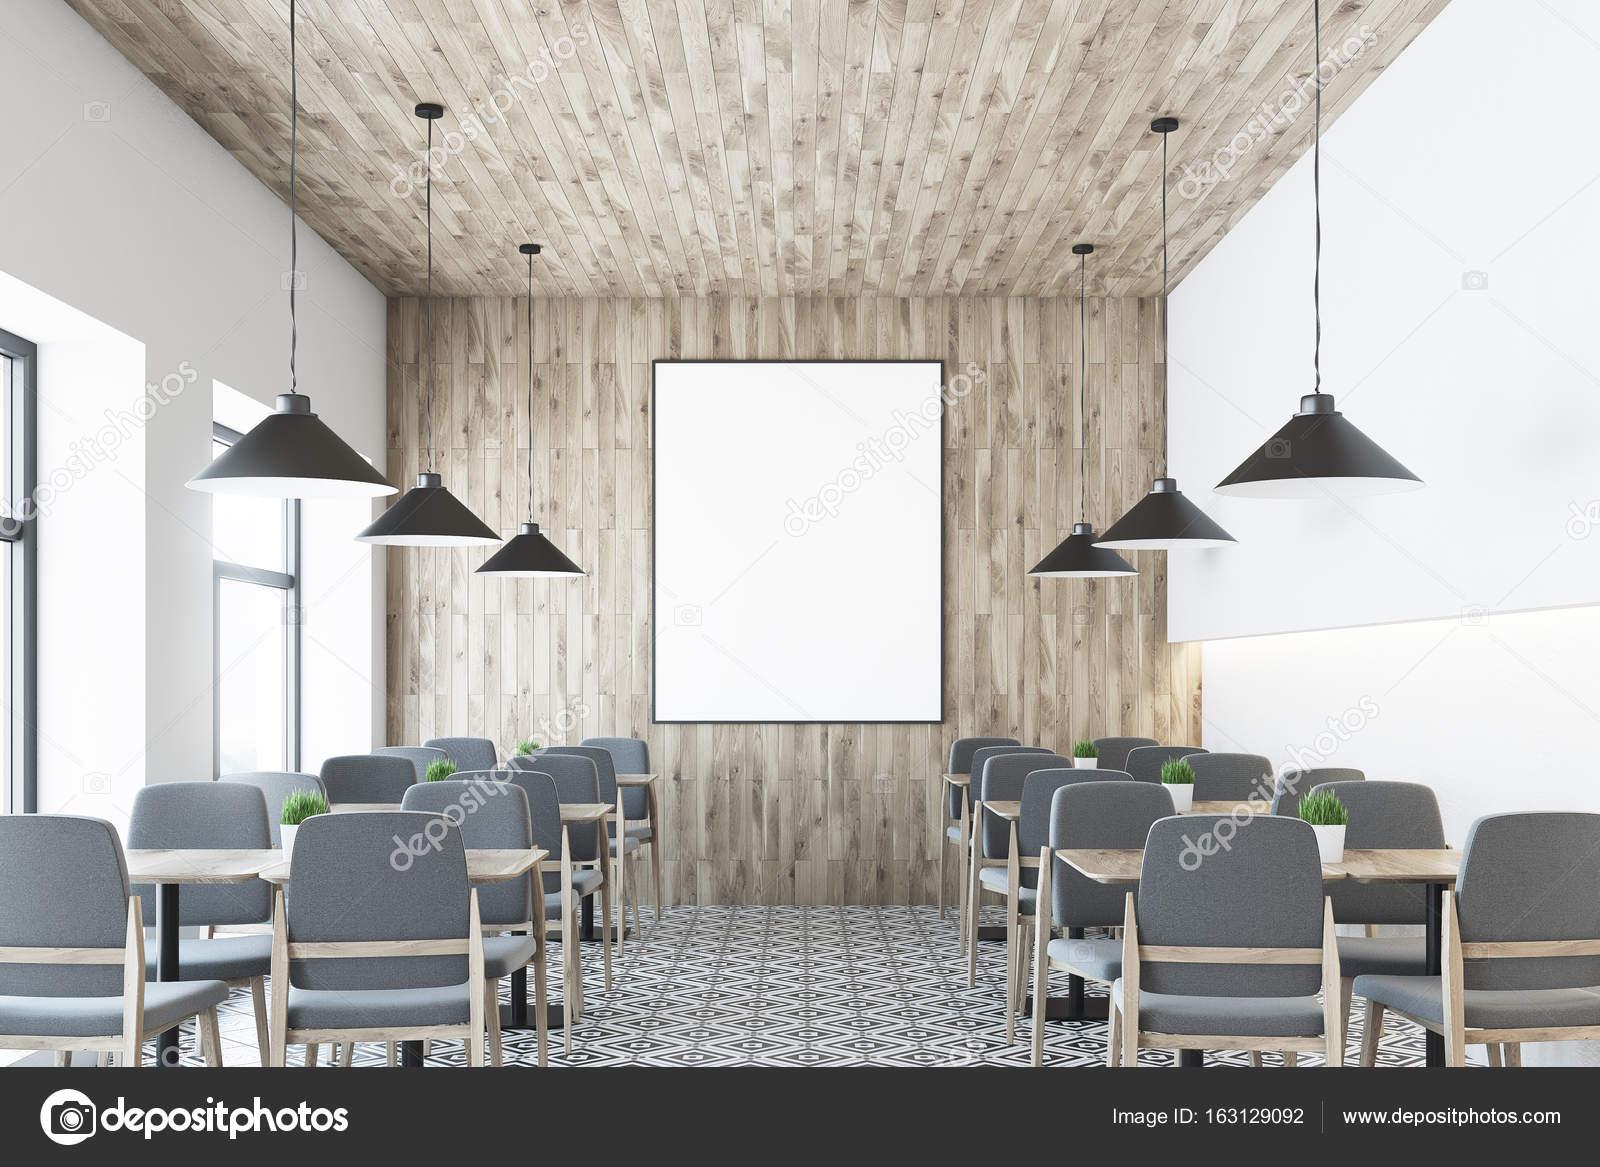 Soffitti In Legno Bianchi : Travi in legno bianche esempi spettacolari e moderni